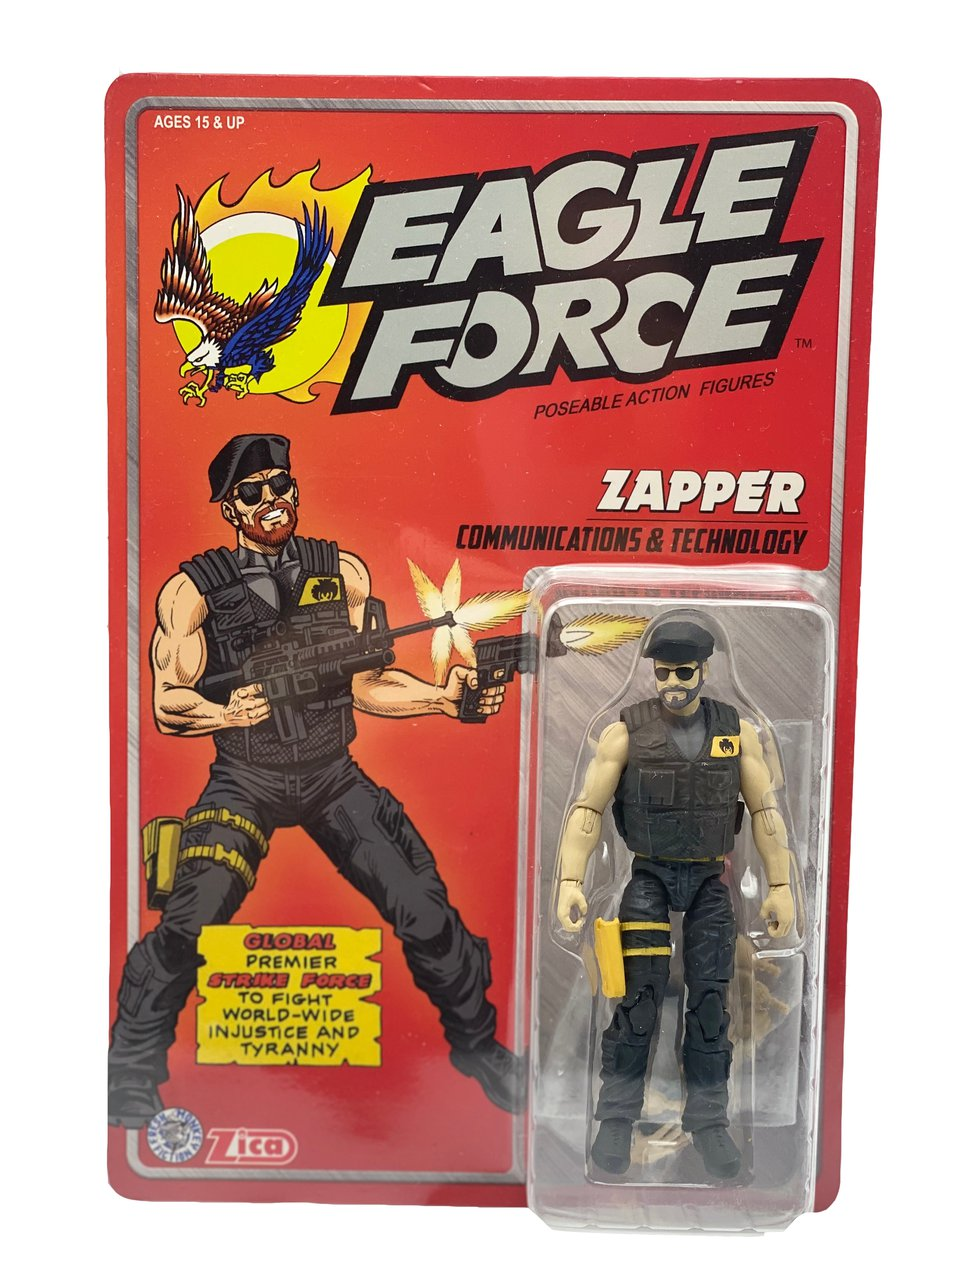 "Eagle Force 4"" Zapper Zica Toys Remco 1:18 Action Force 3.75 GI Joe"